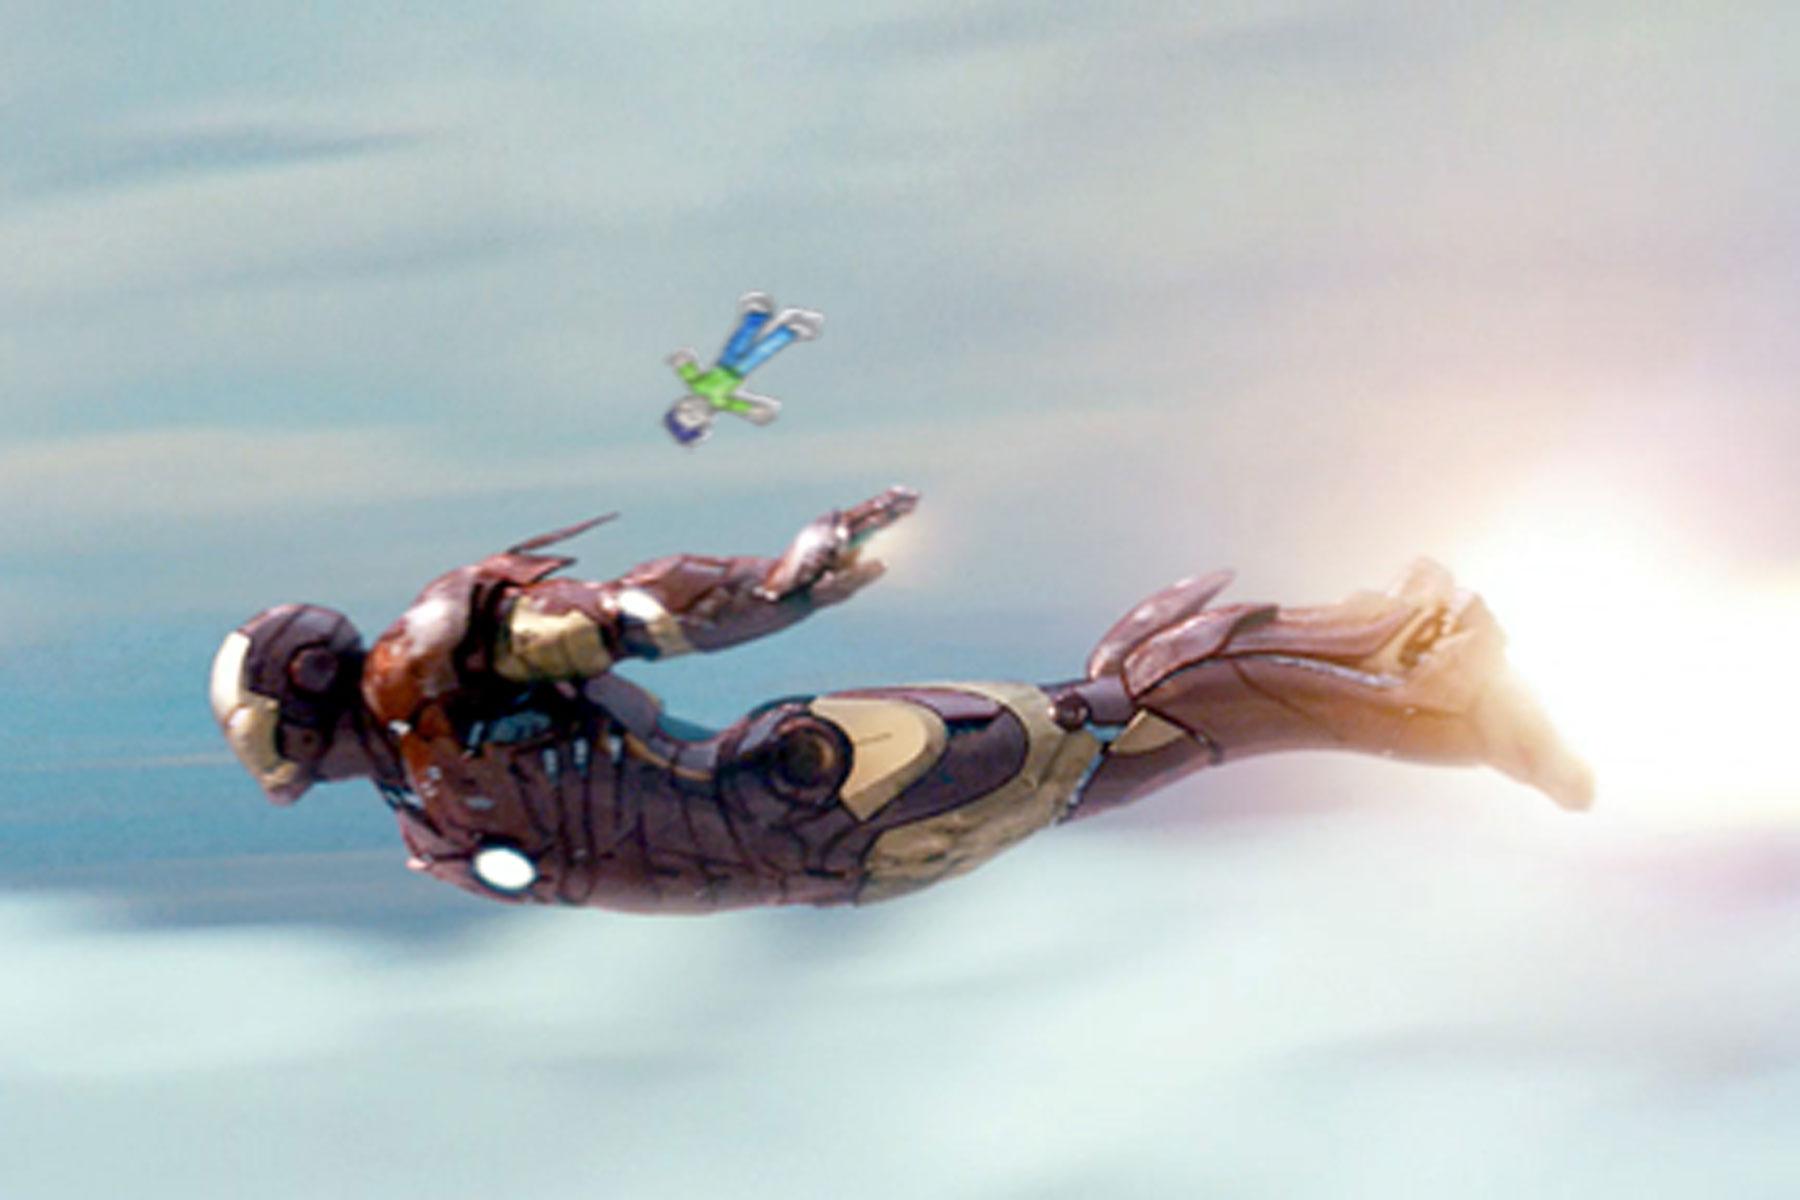 Bug Martini 12 Blake Flies With Iron Man